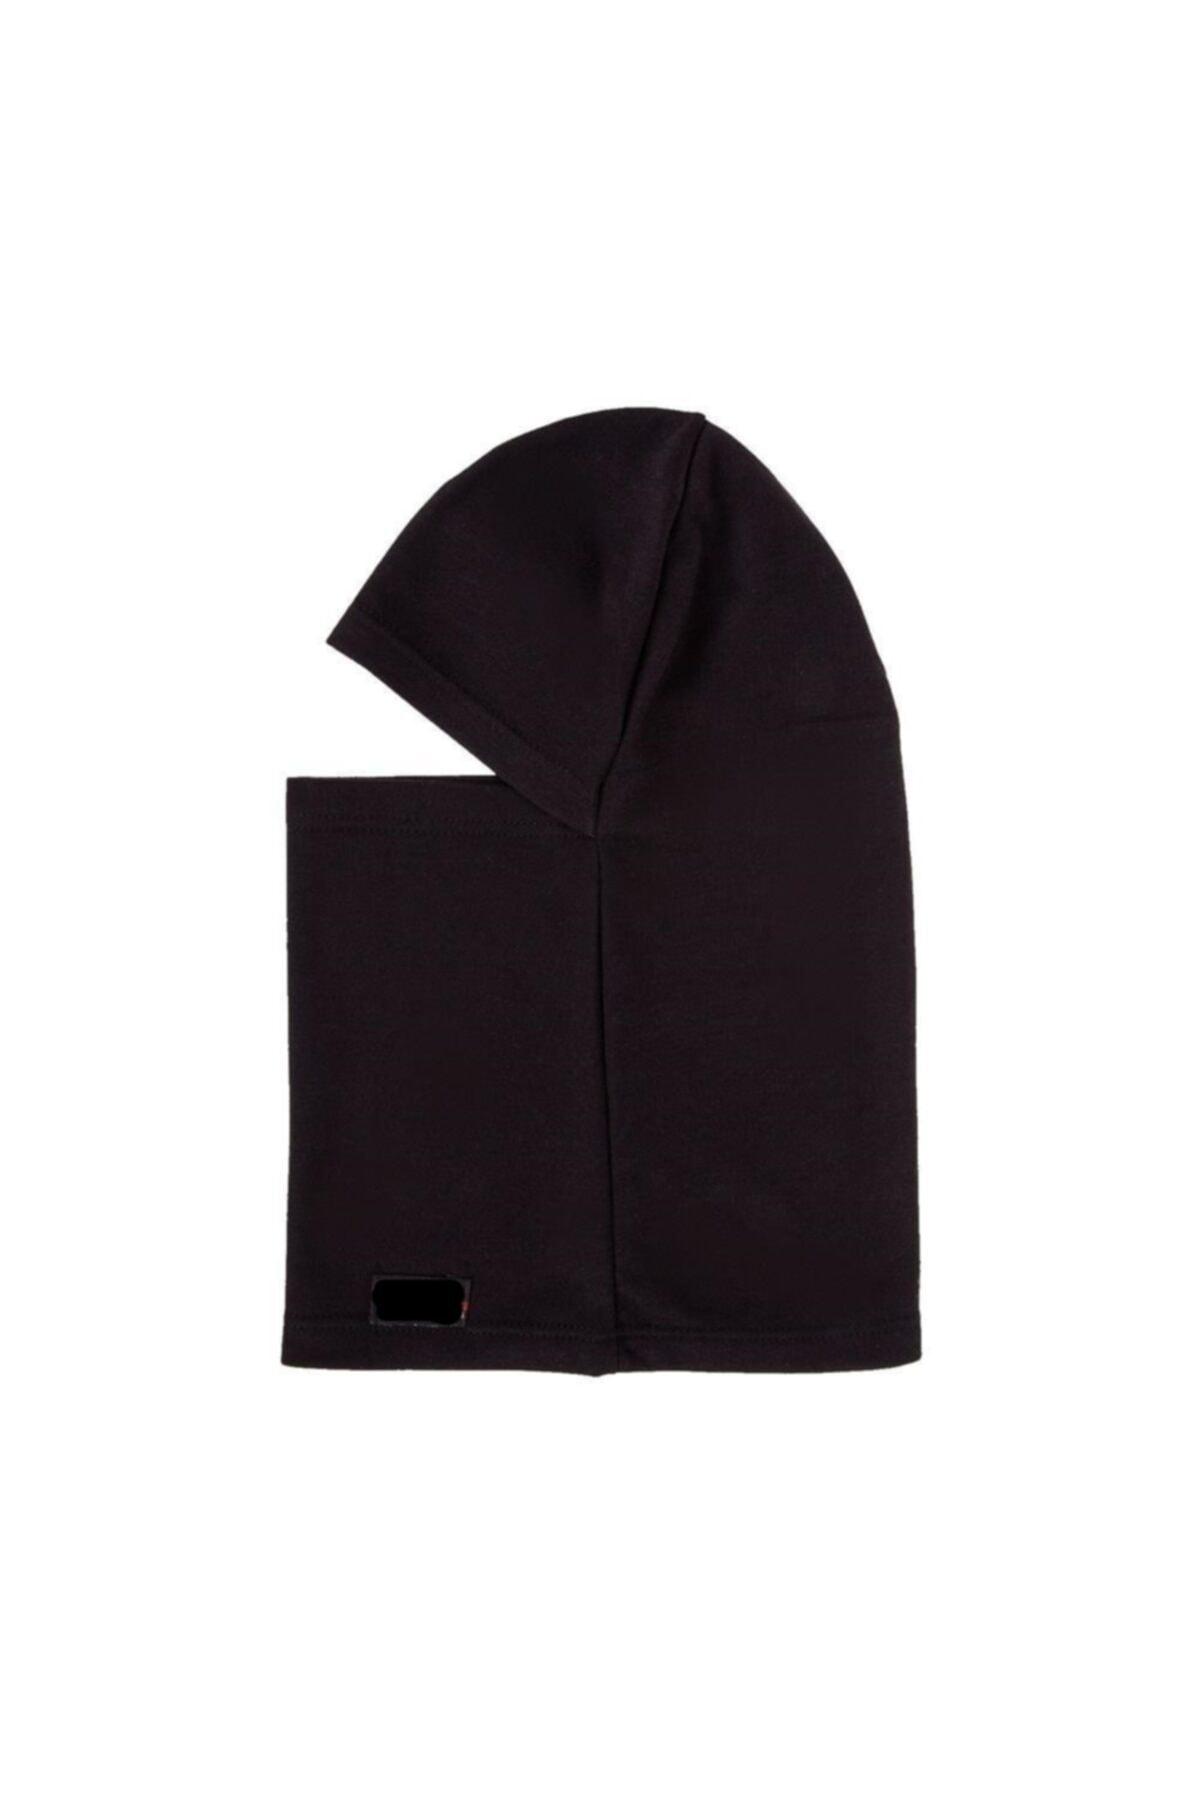 THERMOFORM Unisex Siyah Kar Maskesi 1